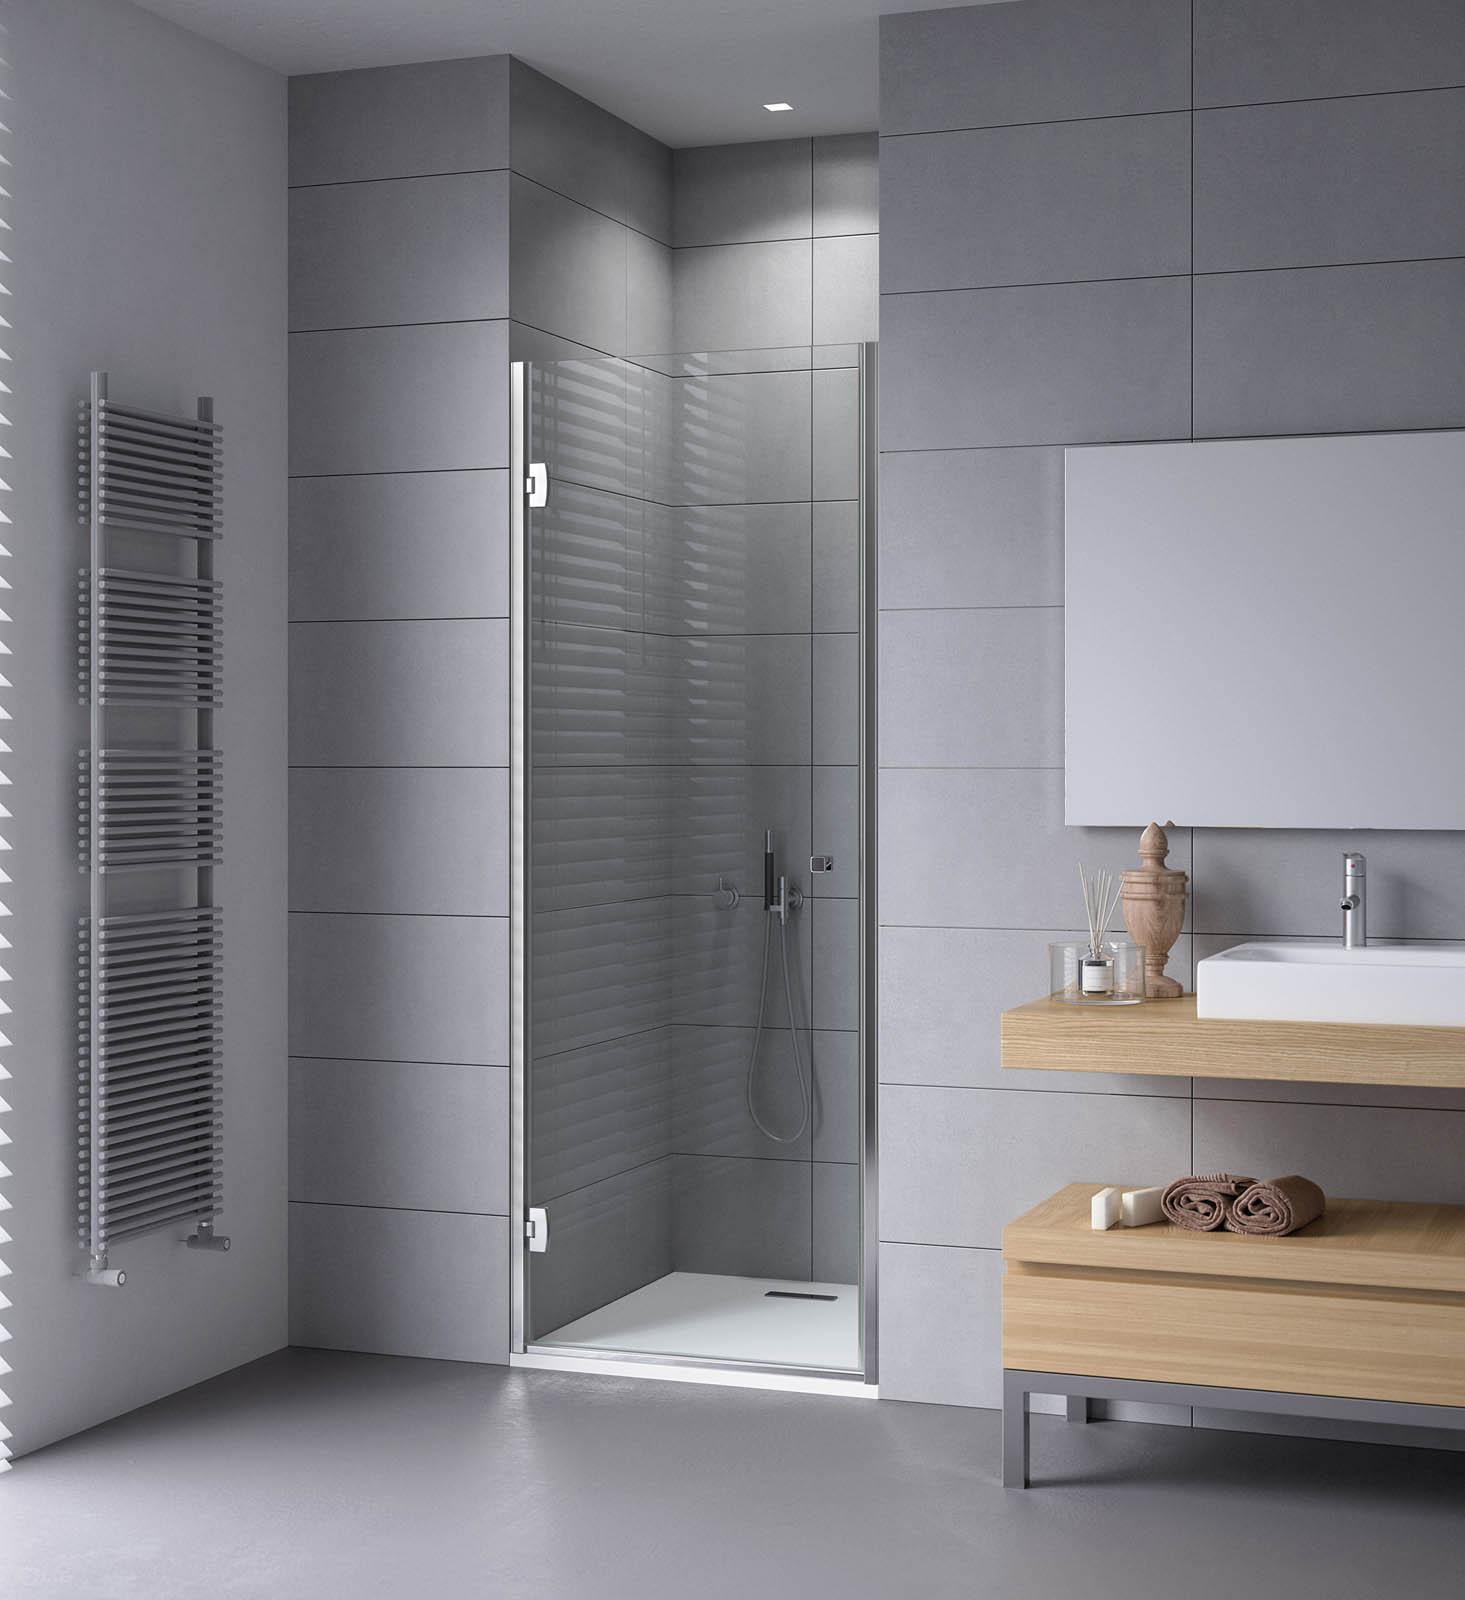 Thiana Recessed Shower Screen With Inwardoutward Opening Door Calibe